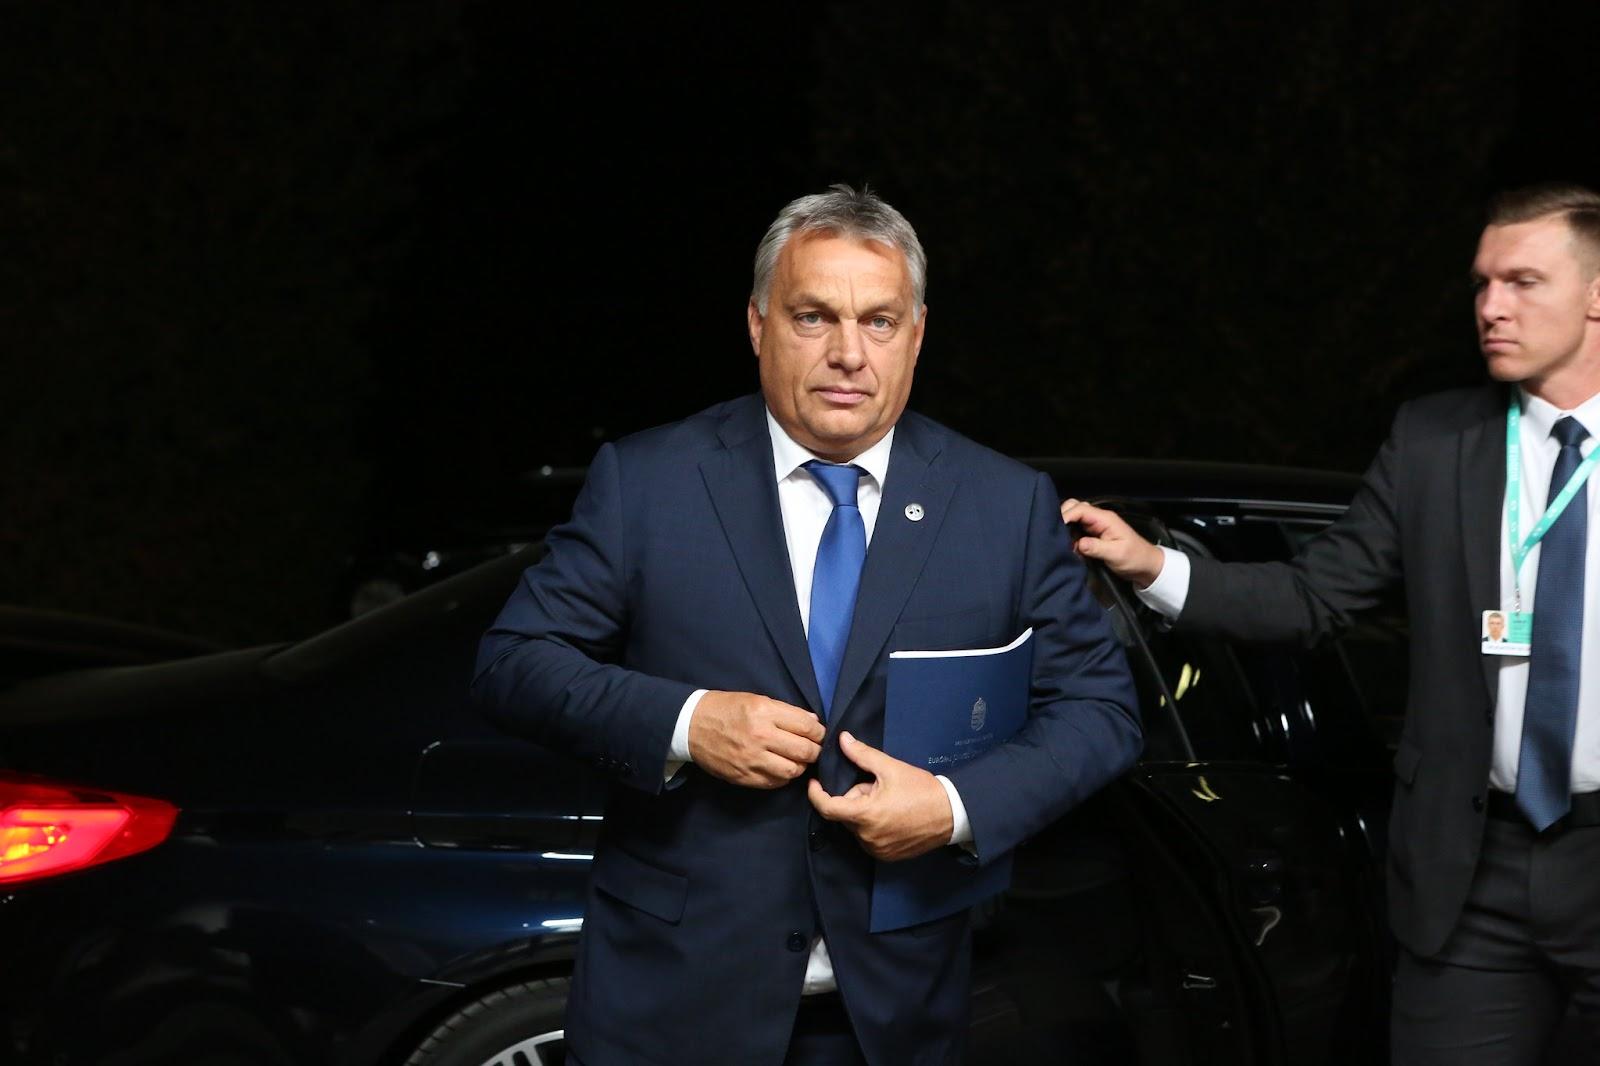 Hungarian Prime Minister Viktor Orban openly champions the model of illiberal representative democracy. (Photo: Annika Haas/CC)